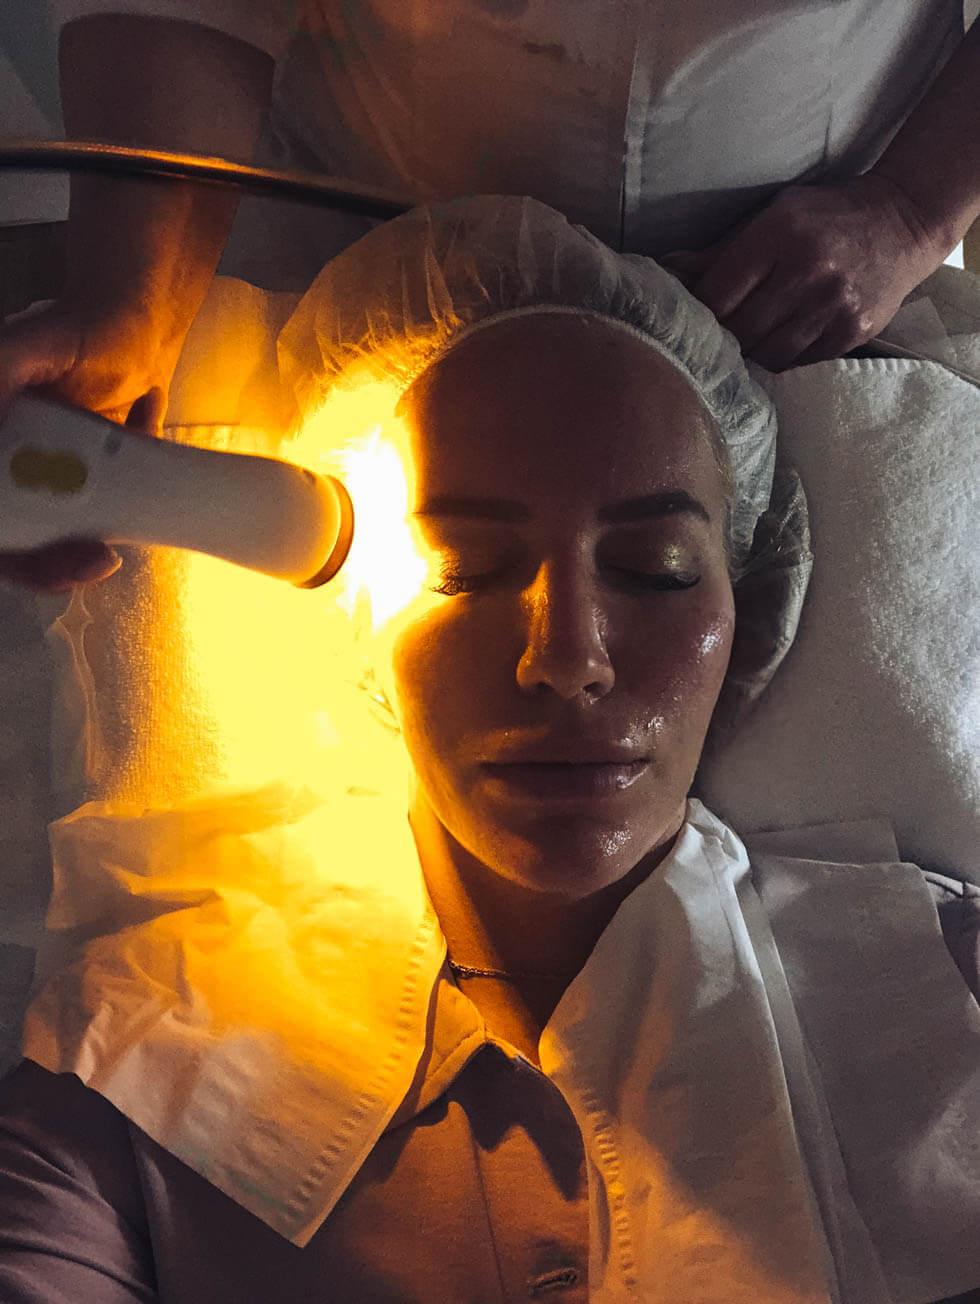 Microdermabrasion- Finslipa huden, damsug och bli kvitt grova porer._-10